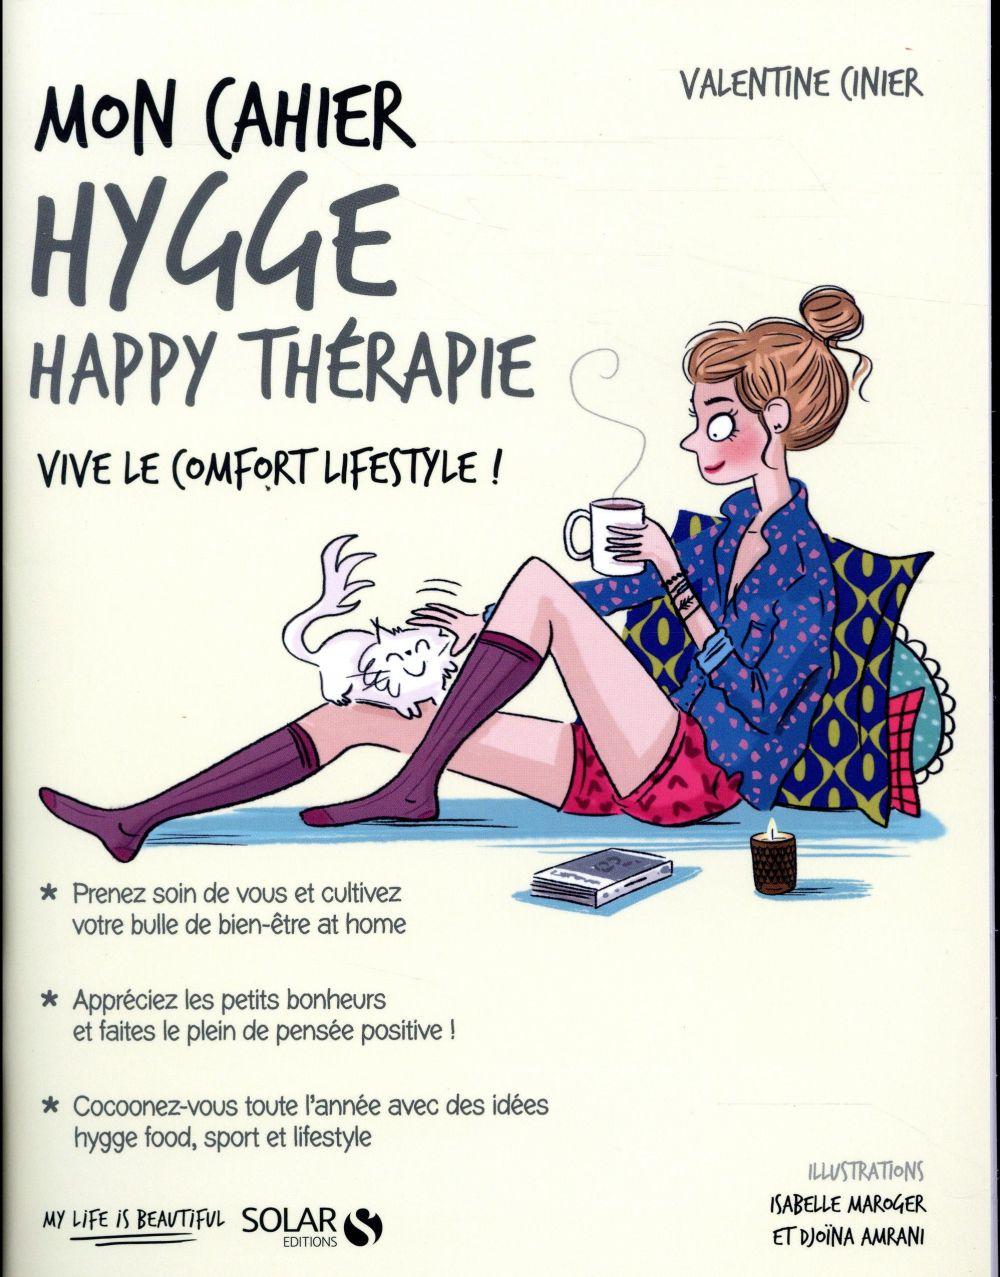 MON CAHIER ; hygge happy thérapie